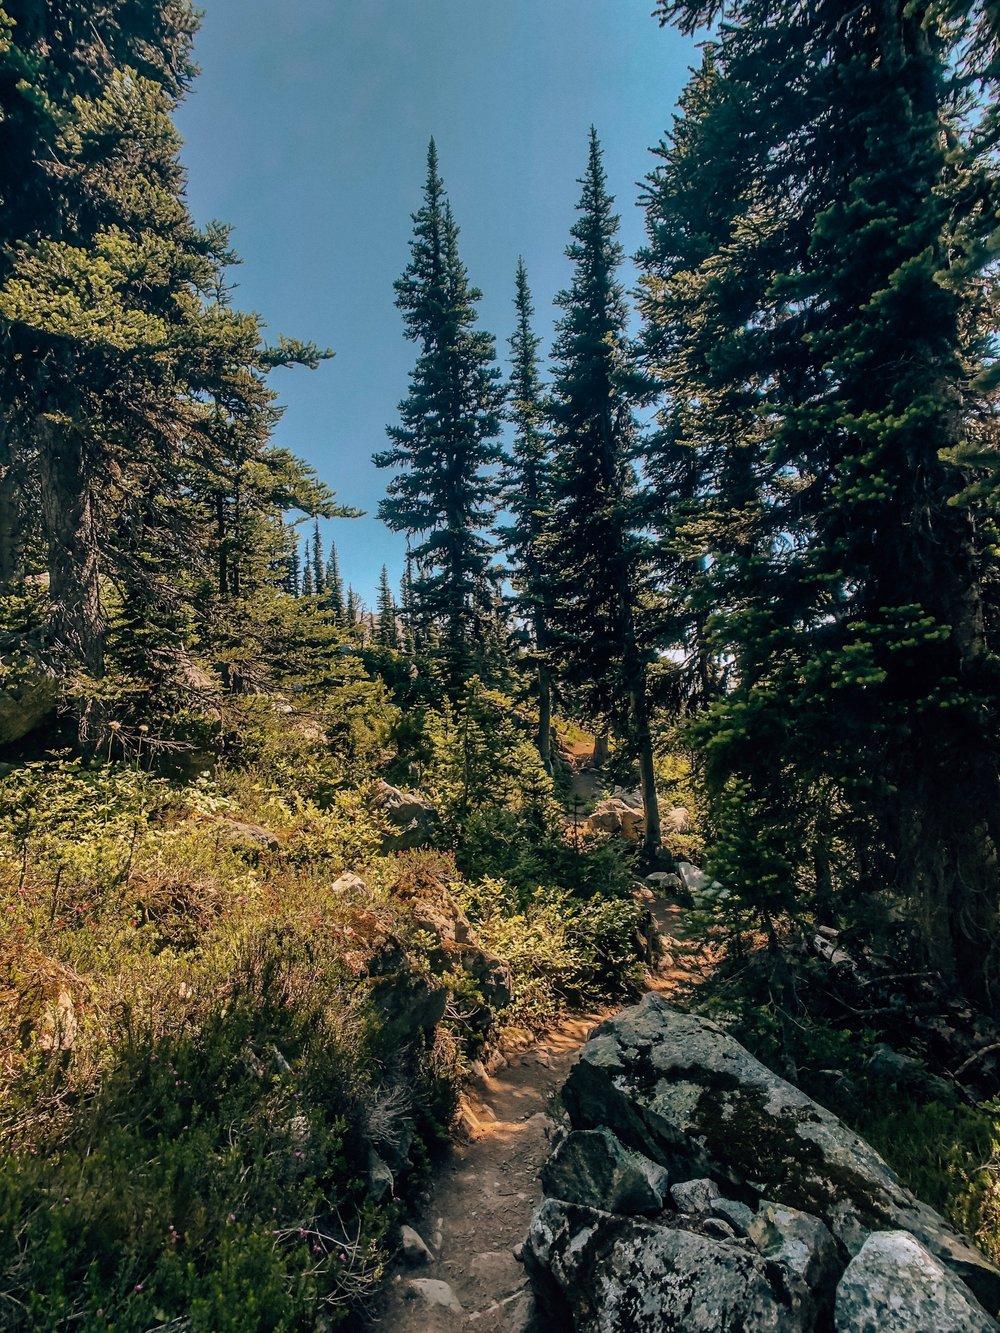 Autumn mountain alpine hikes in Canada